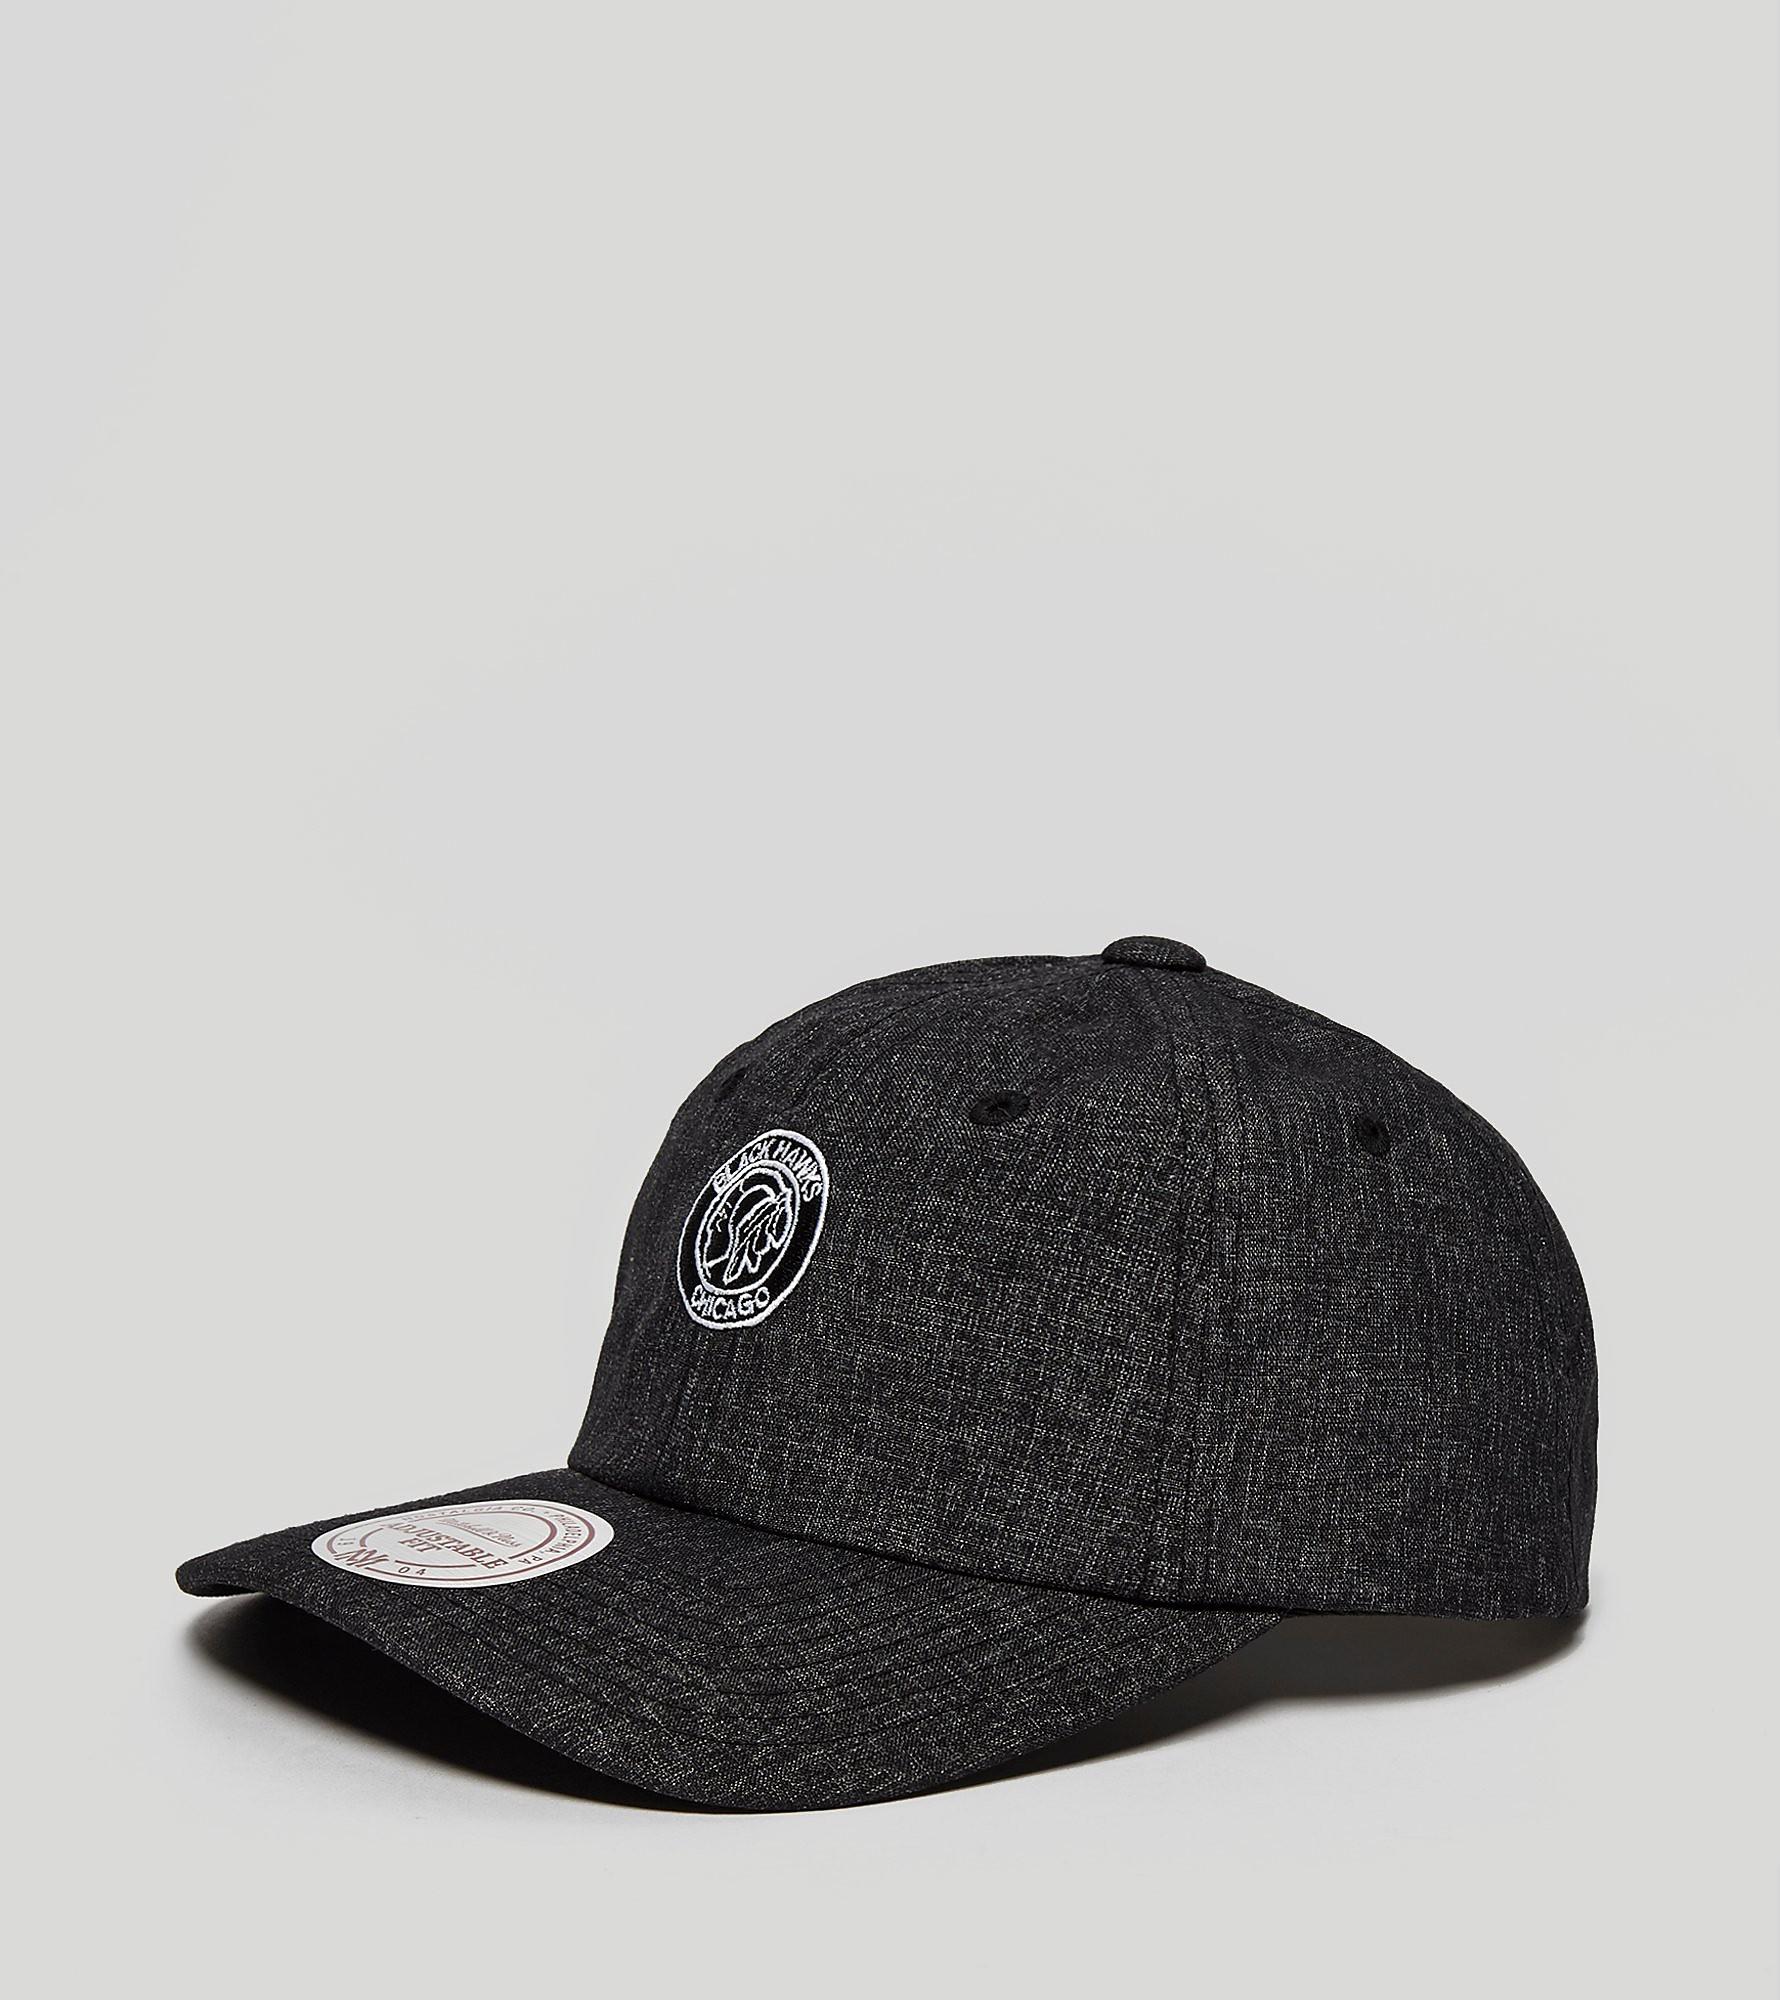 Mitchell & Ness Melange Blackhawks Snapback Cap